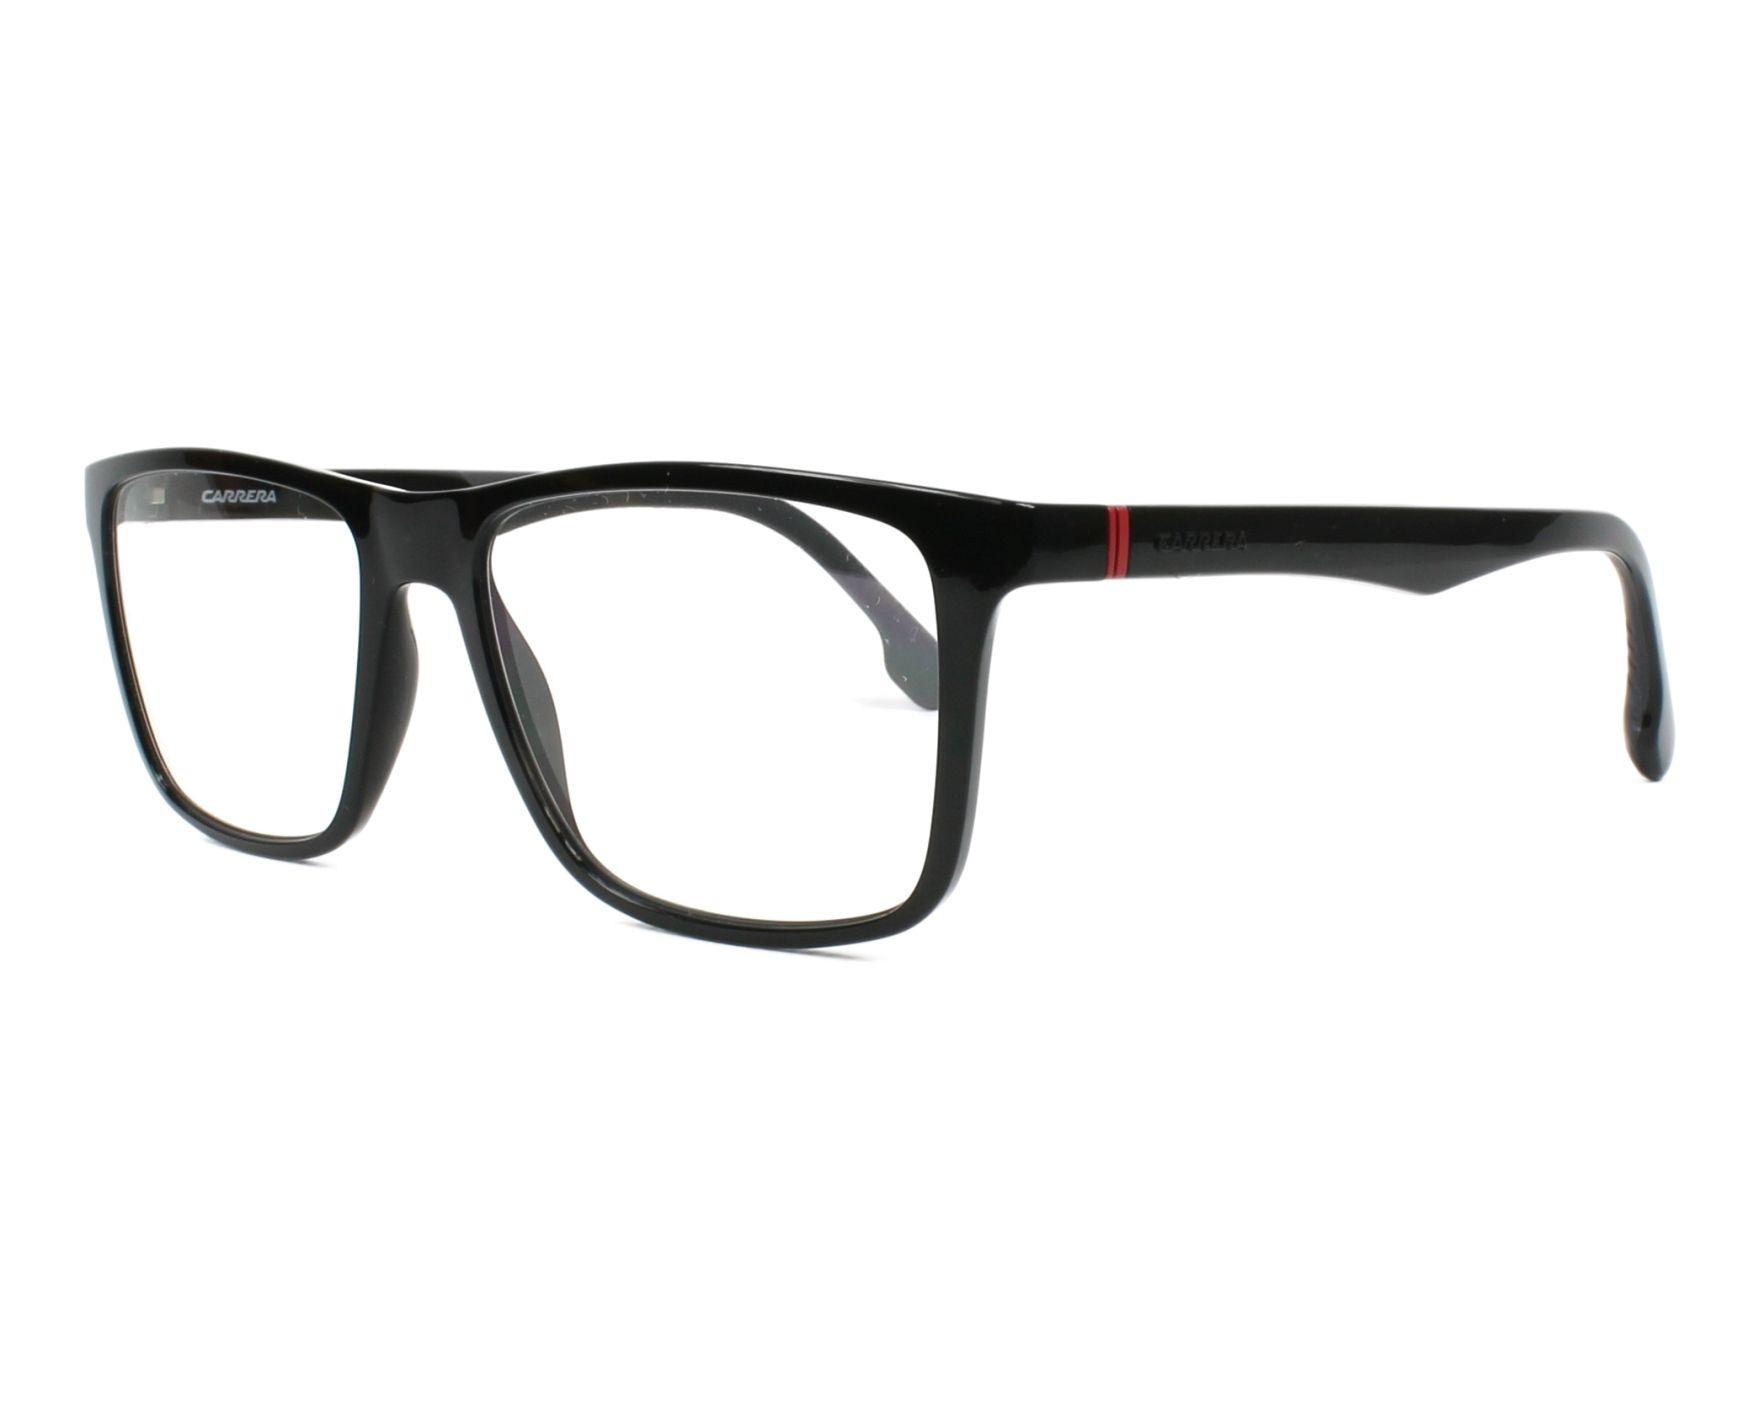 Carrera Eyeglasses Black 4009-CS 807 - Visionet US